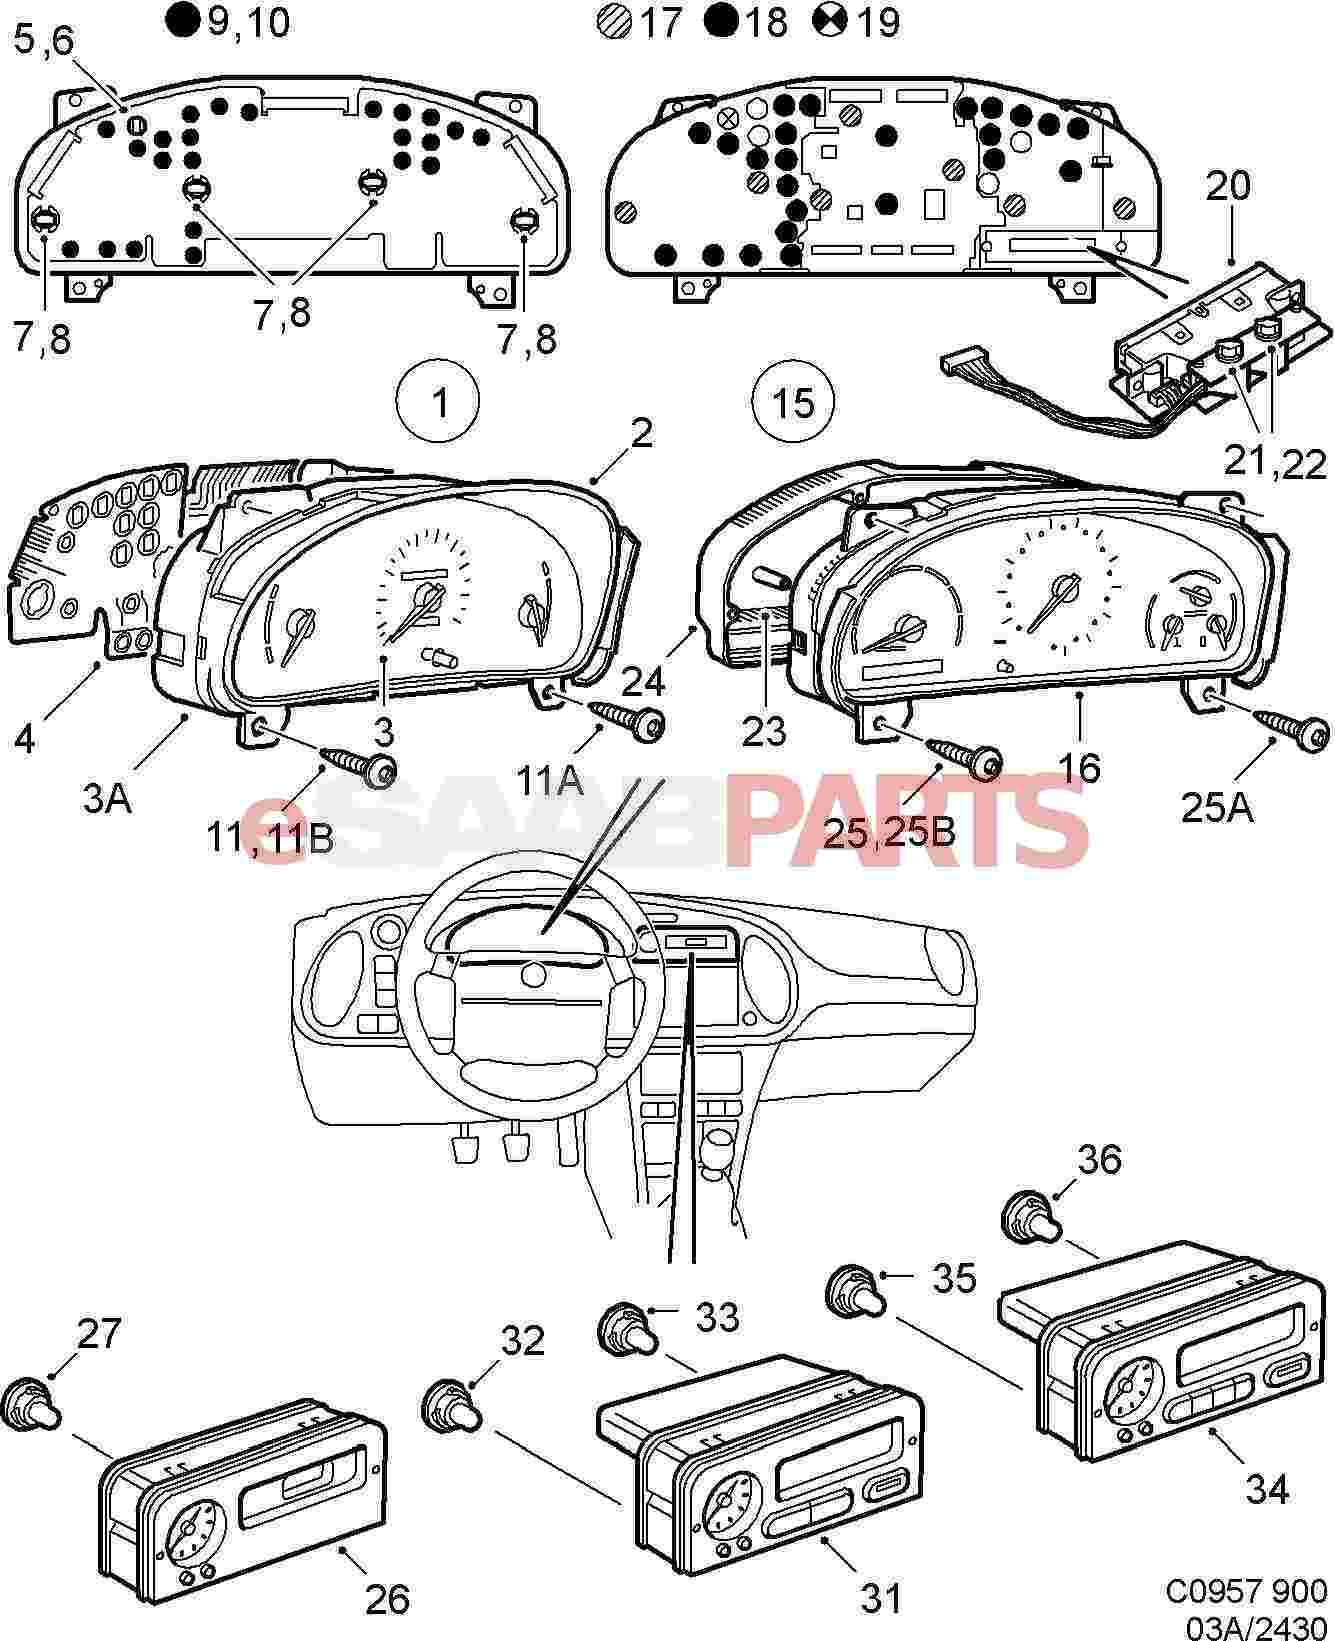 2002 saab 9 3 convertible wiring diagram